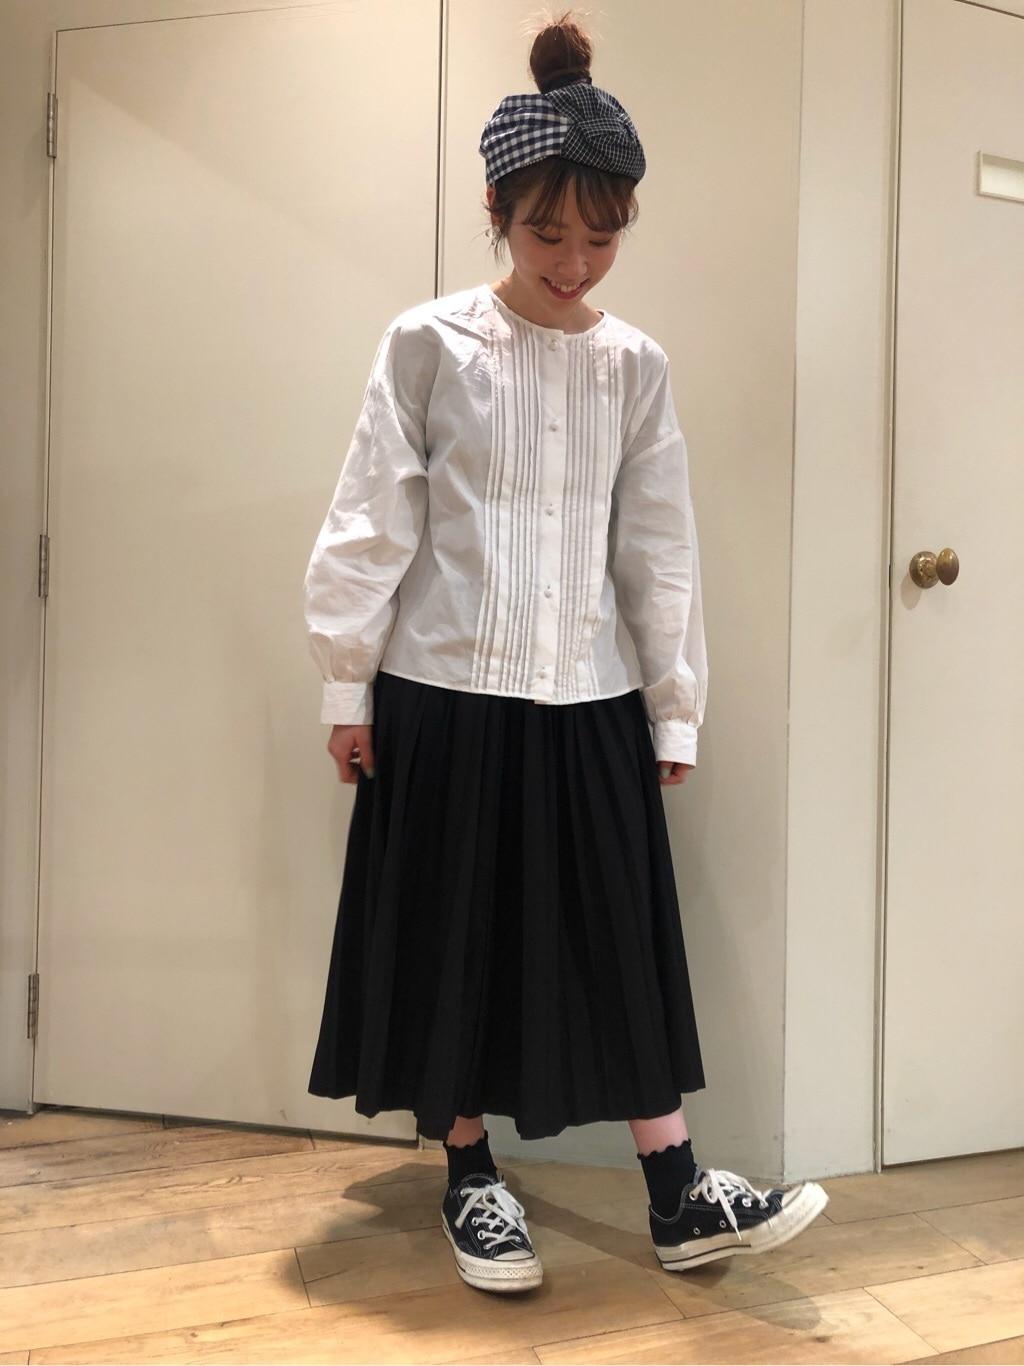 bulle de savon 新宿ミロード 身長:154cm 2020.03.16